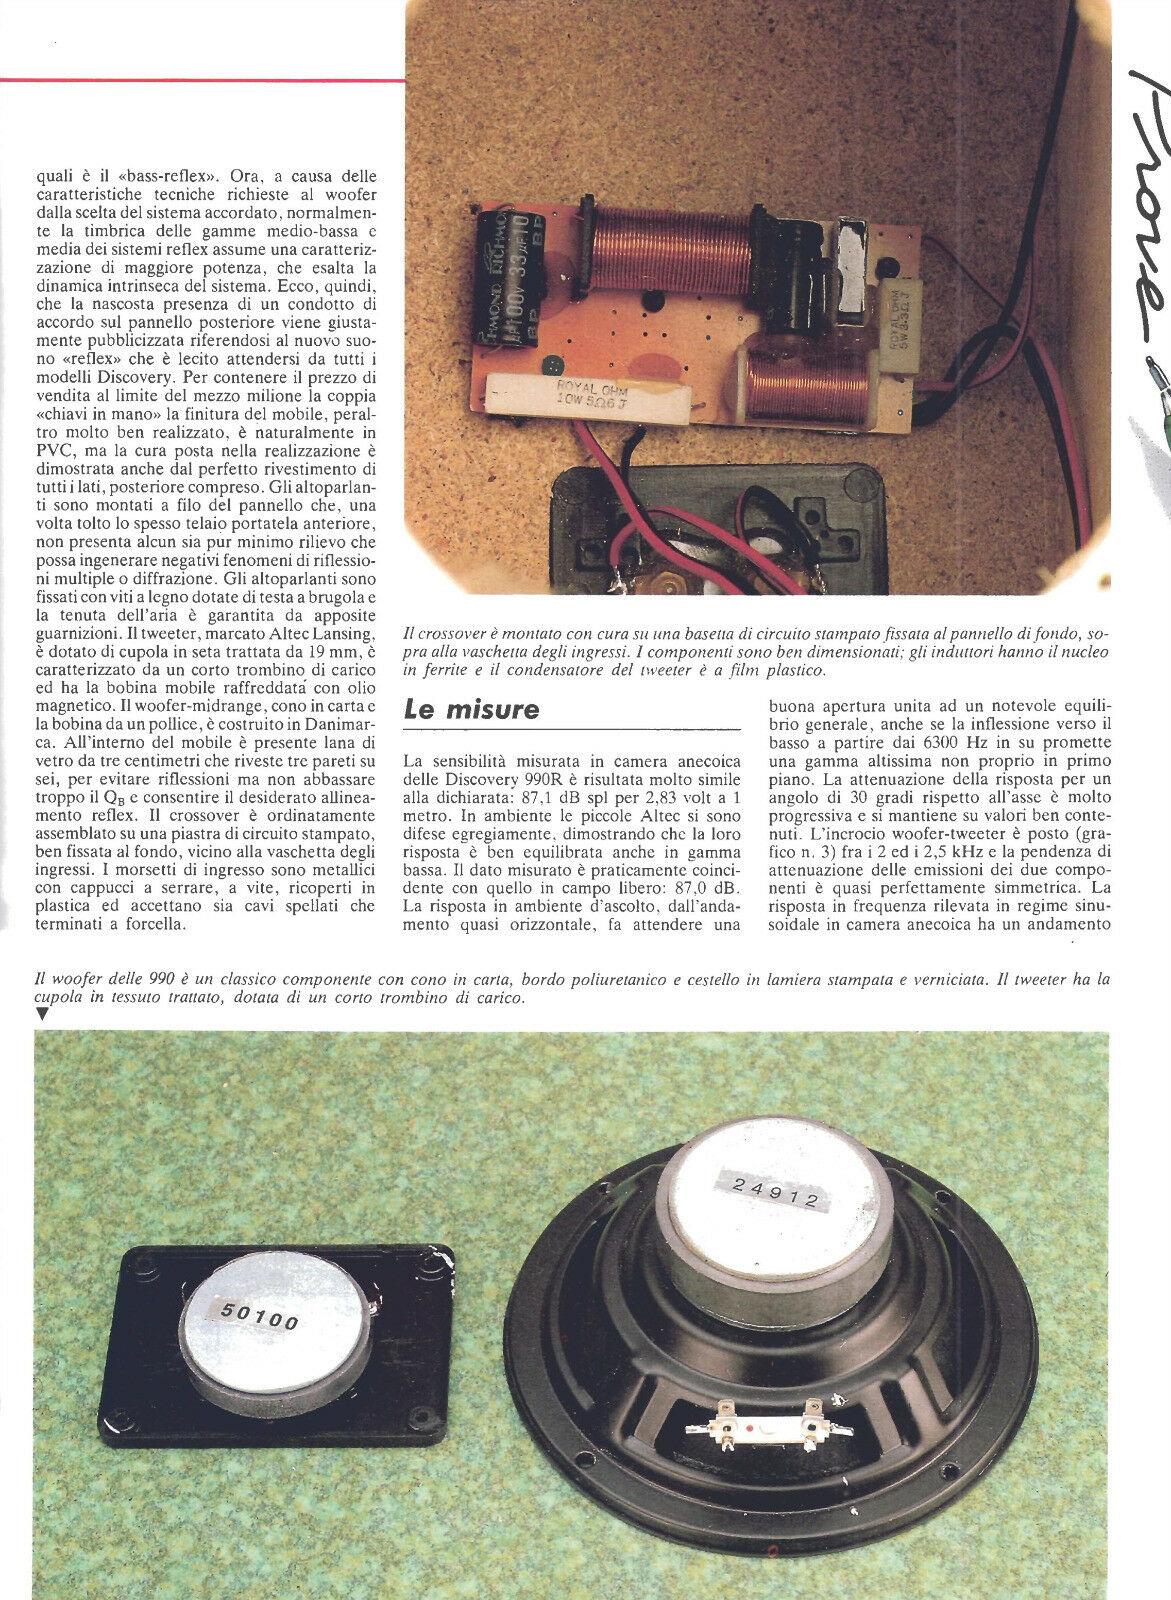 Acoustic Research AR12: restauro o... - Pagina 2 Diffus15